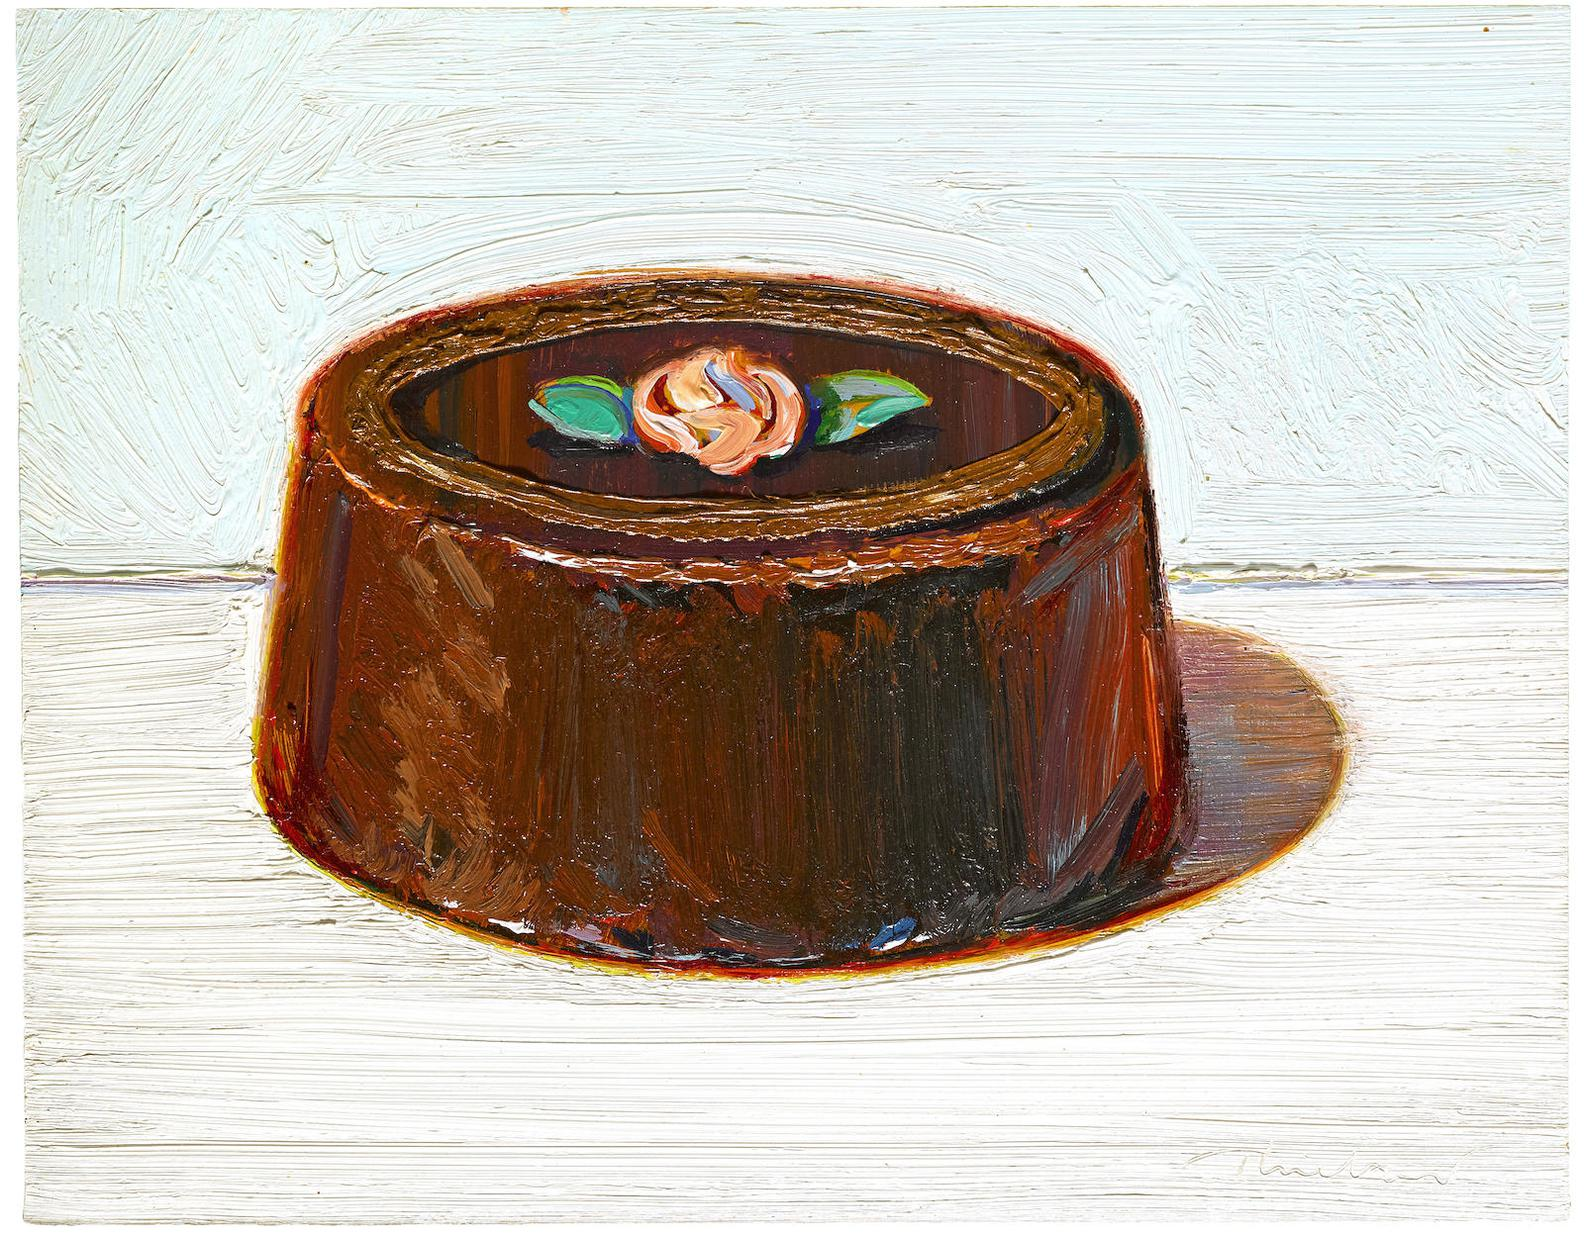 Wayne Thiebaud-Camellia Cake-1995